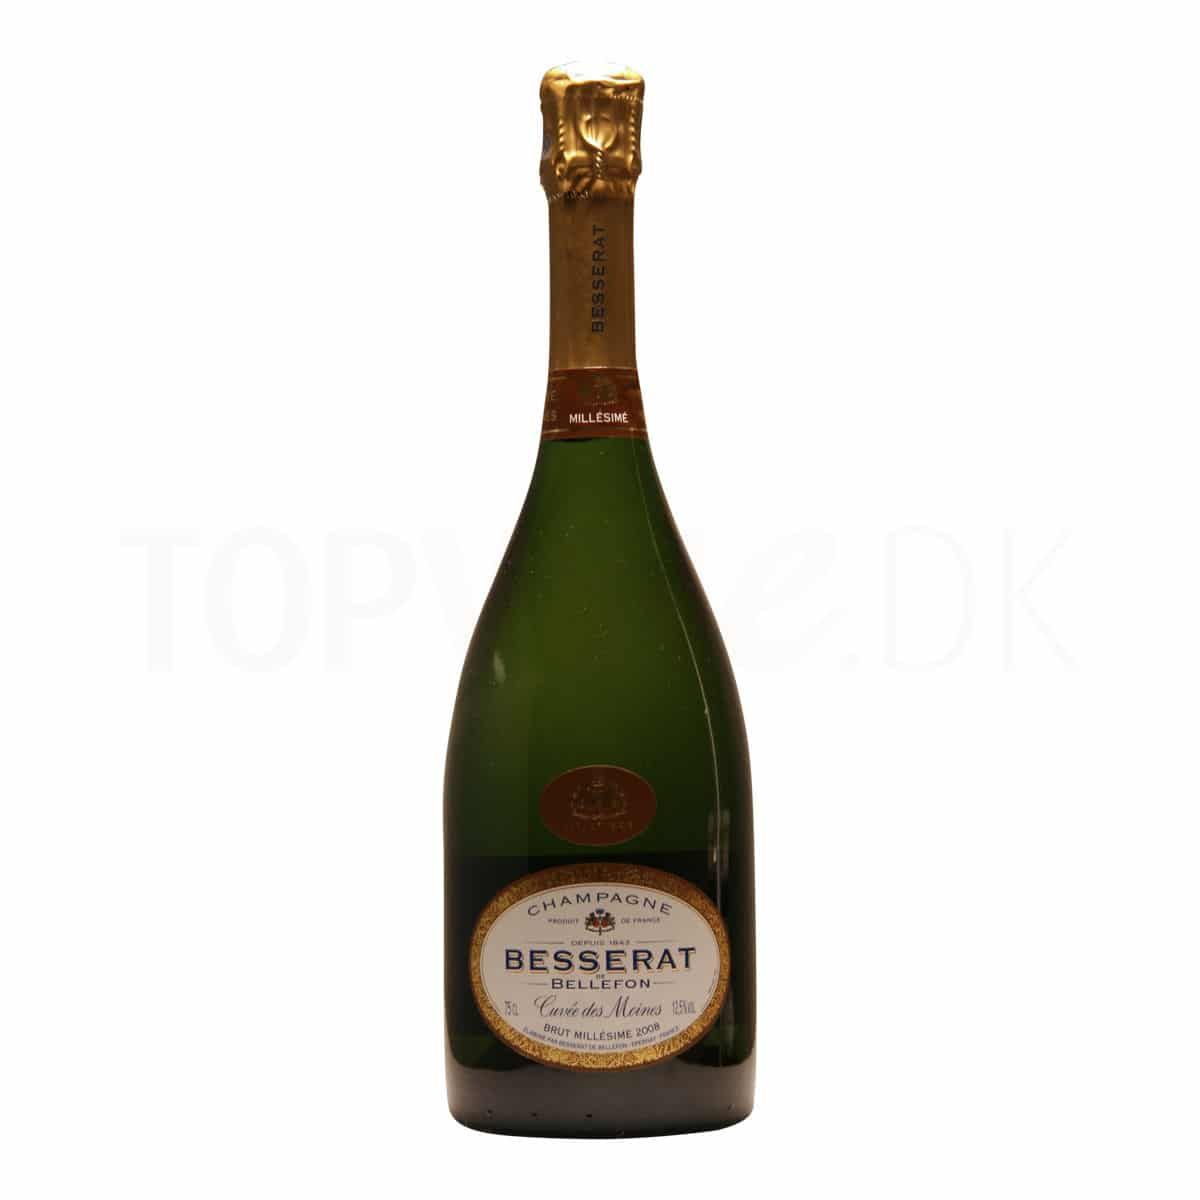 Topvine Besserat champagne Brut Millesime 2008